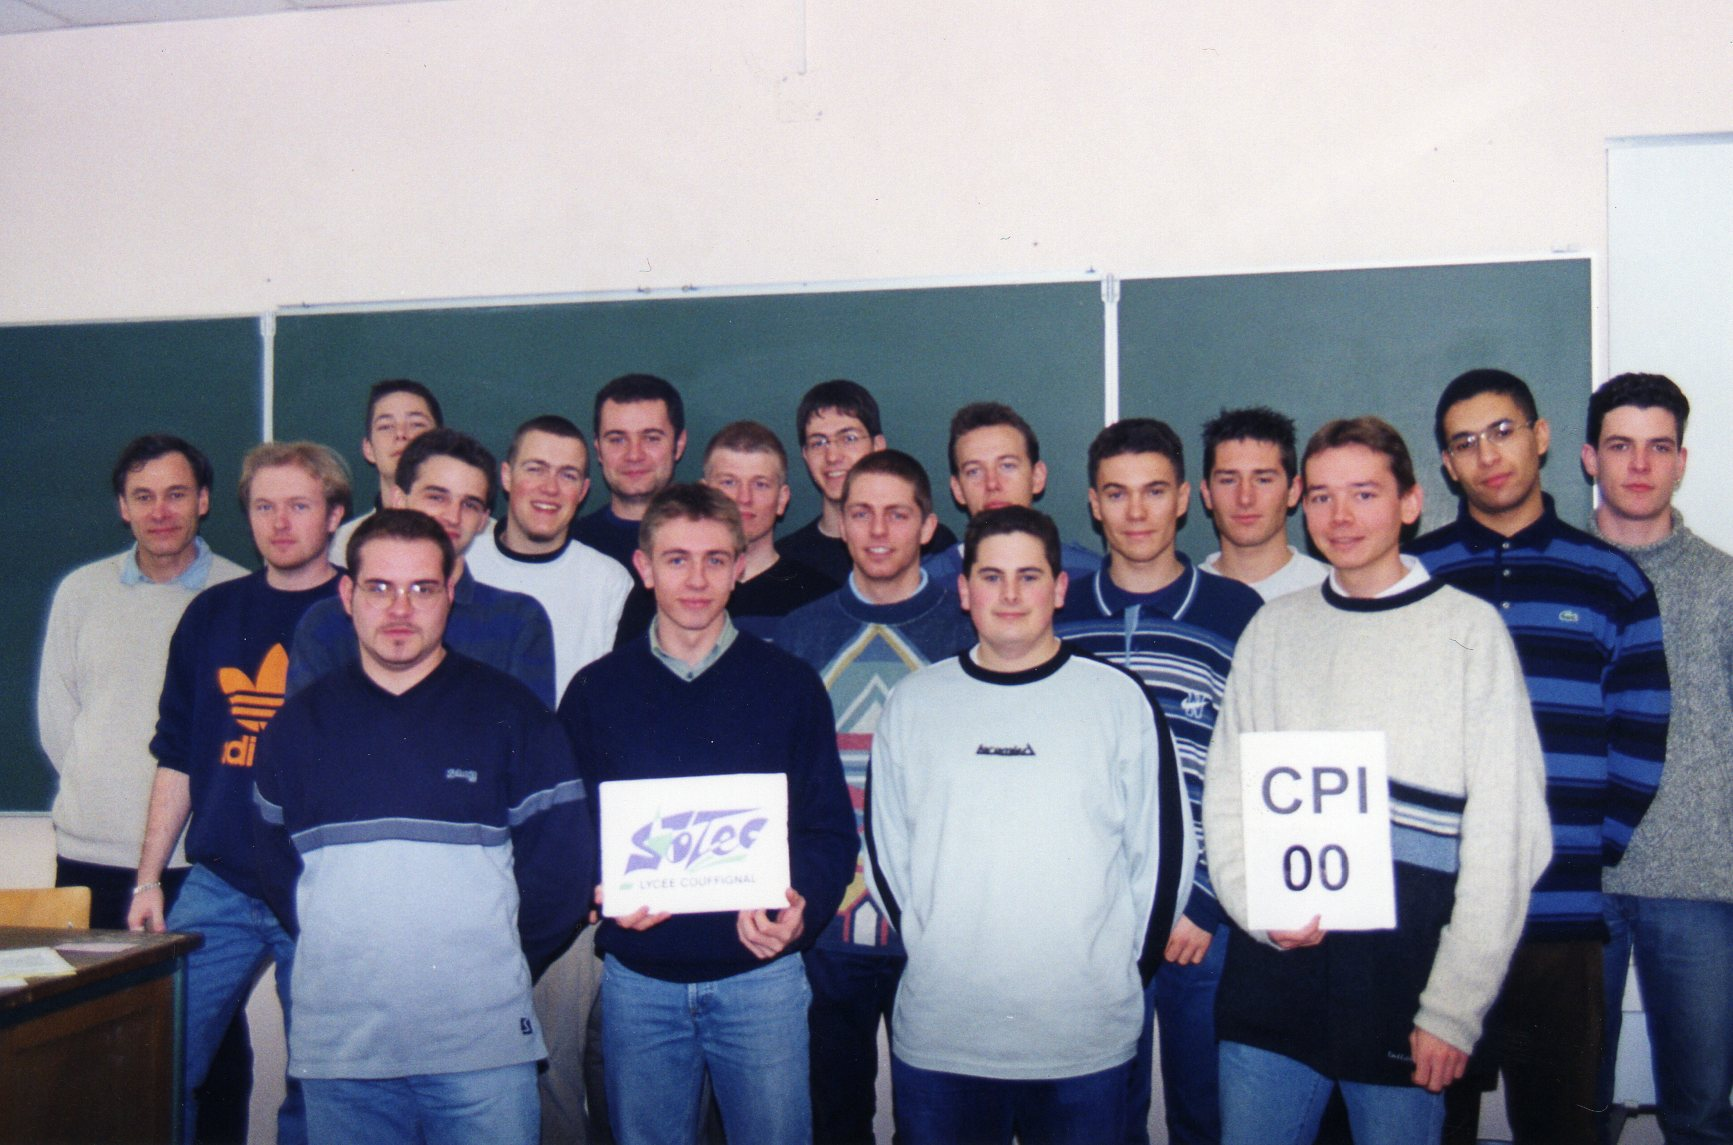 CPI00.jpg